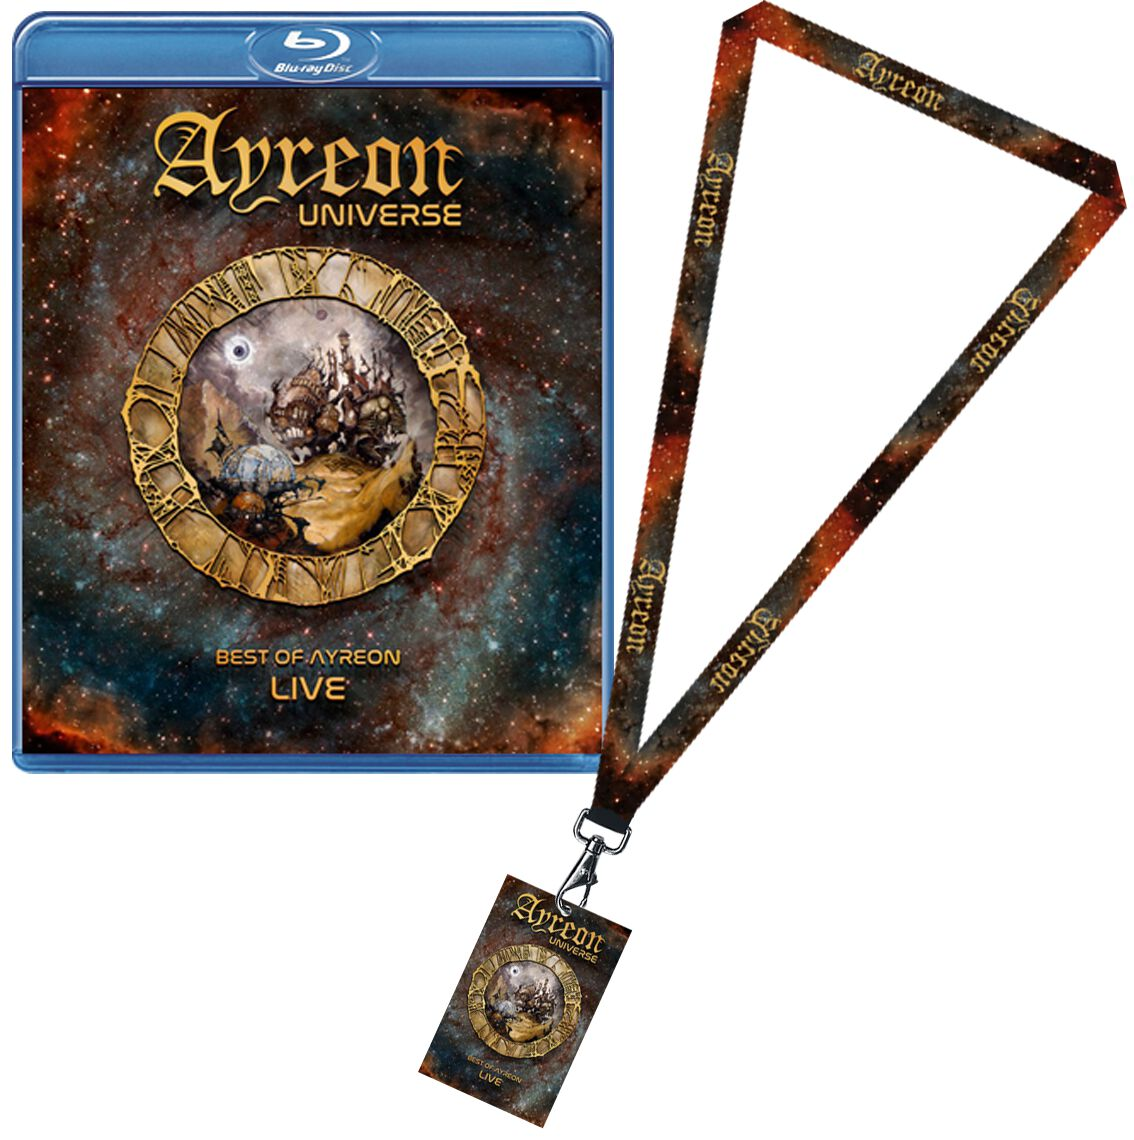 Ayreon Ayreon universe - Best of Ayreon live Bl...